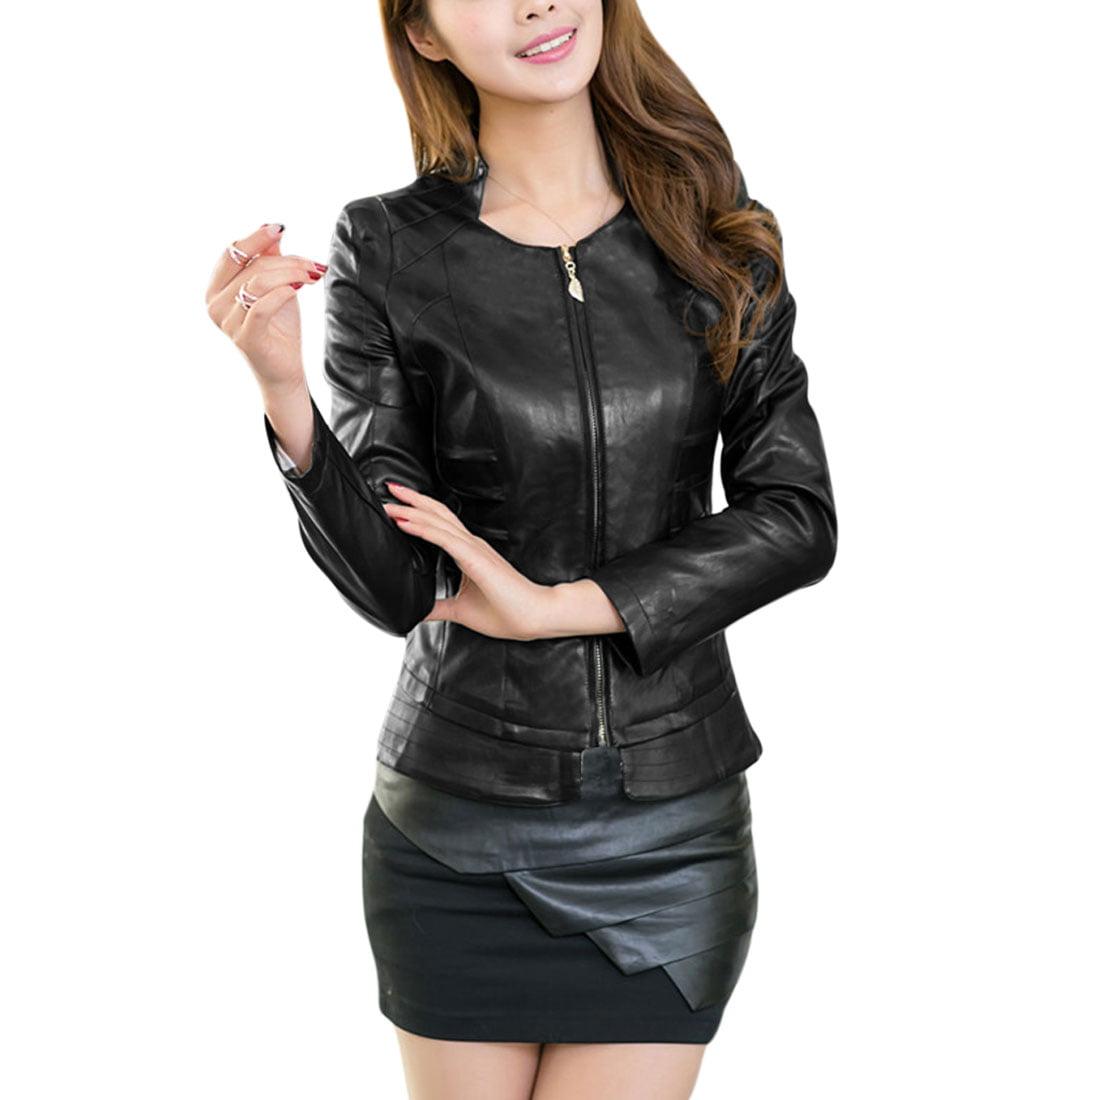 Ladier Stand Collar Zipper Slim Fit Stylish Imitaion Leather Jacket Black L